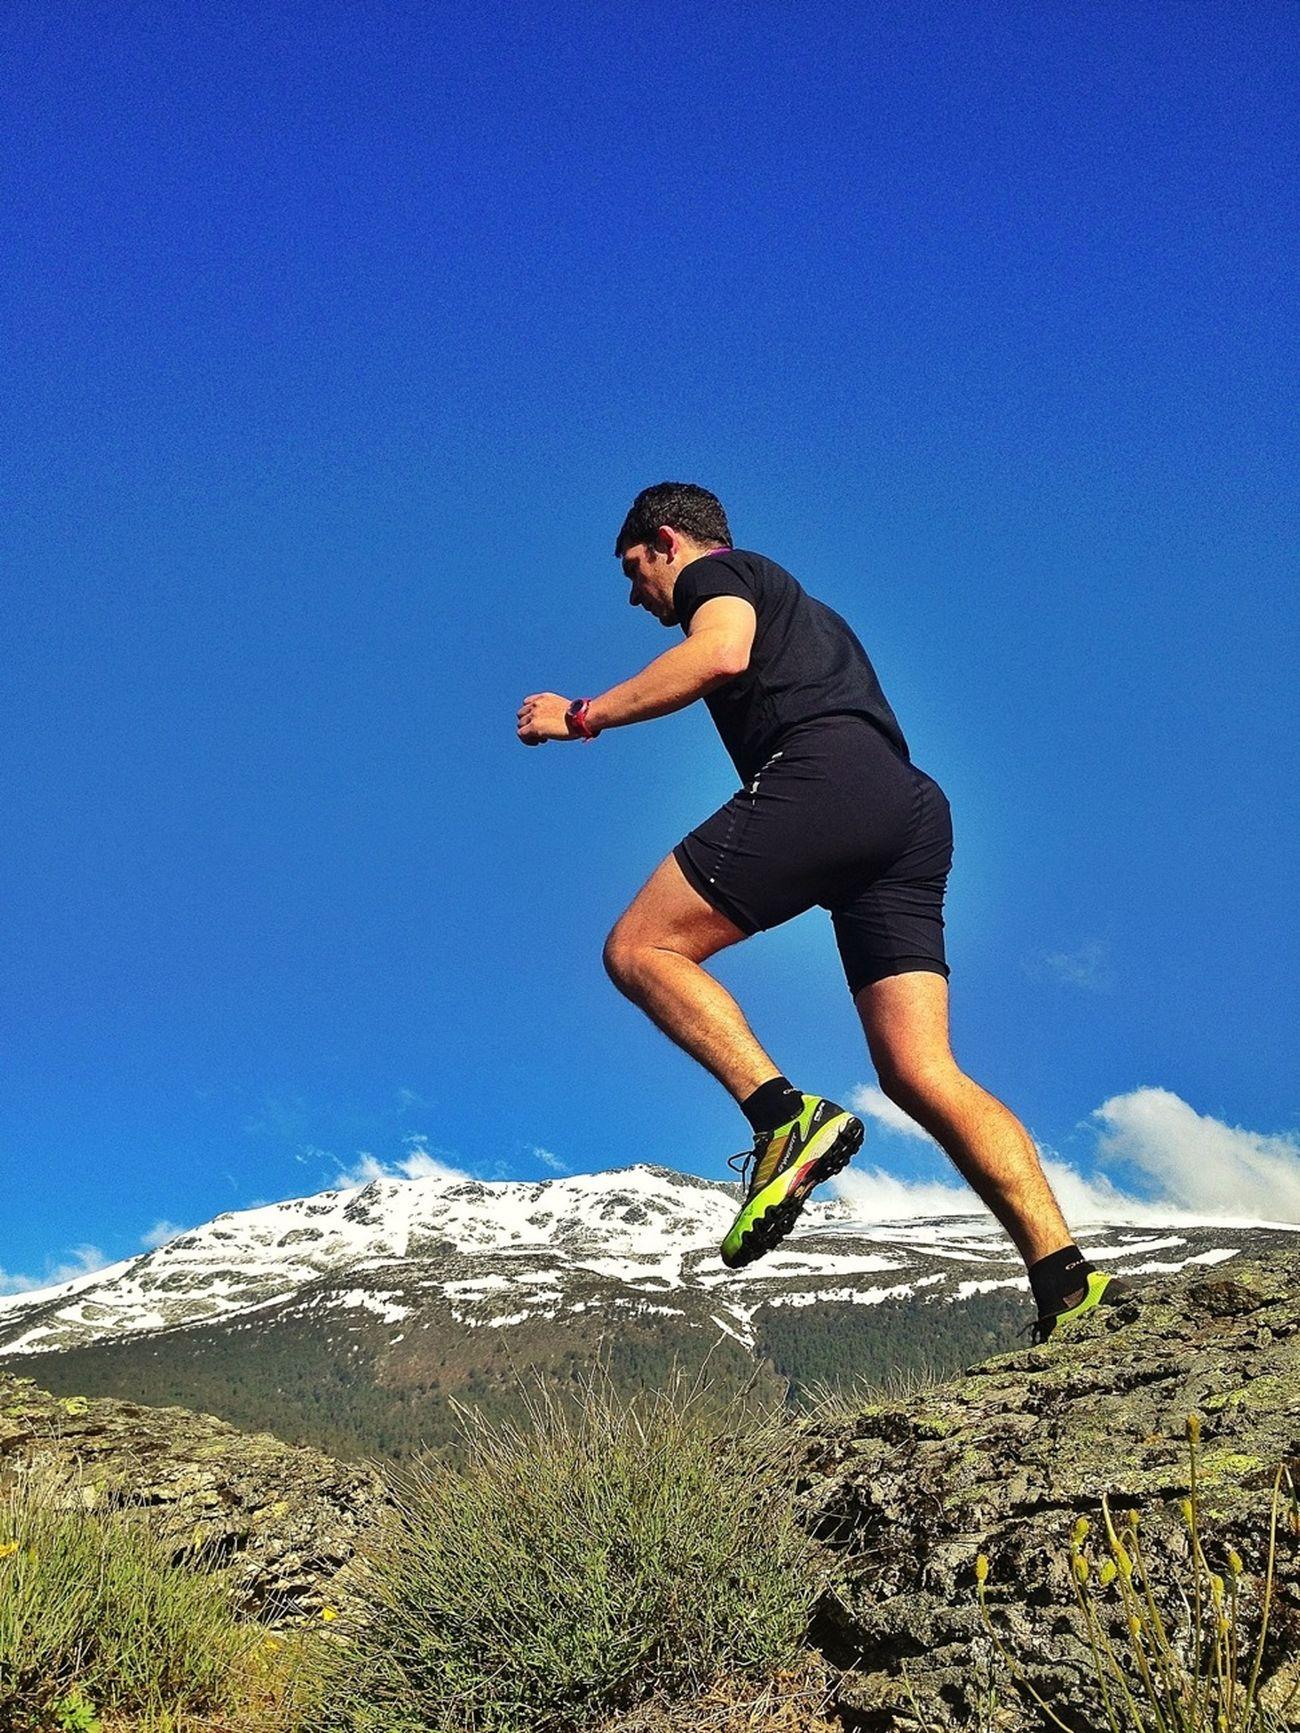 Jump & Summit #trailrunning #CabezaMediana #valledelLozoya #training #gasss #dynafit #felineghost #mountain #ilovemountains #spring #primavera #beforework #SuuntoAmbitions #Dynafitfinde #peñalara